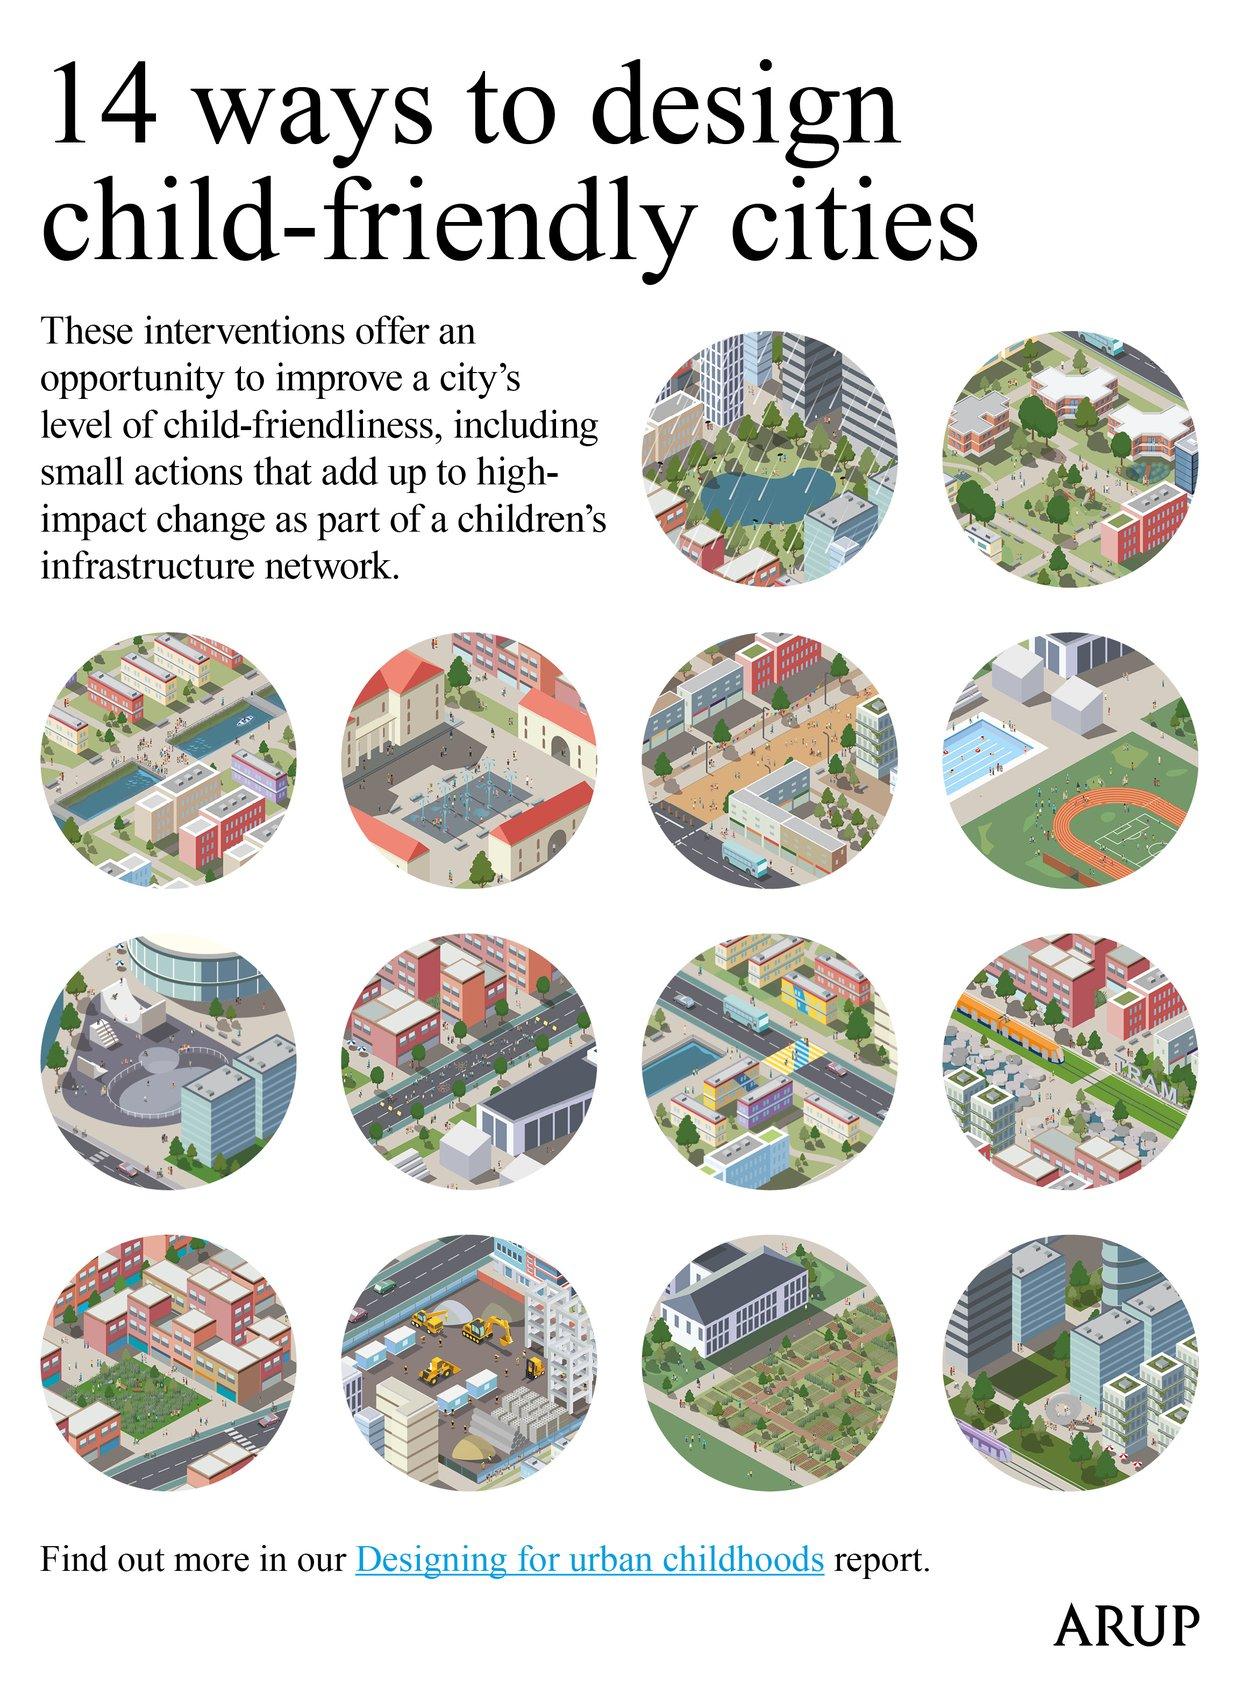 14 ways to design child-friendly cities